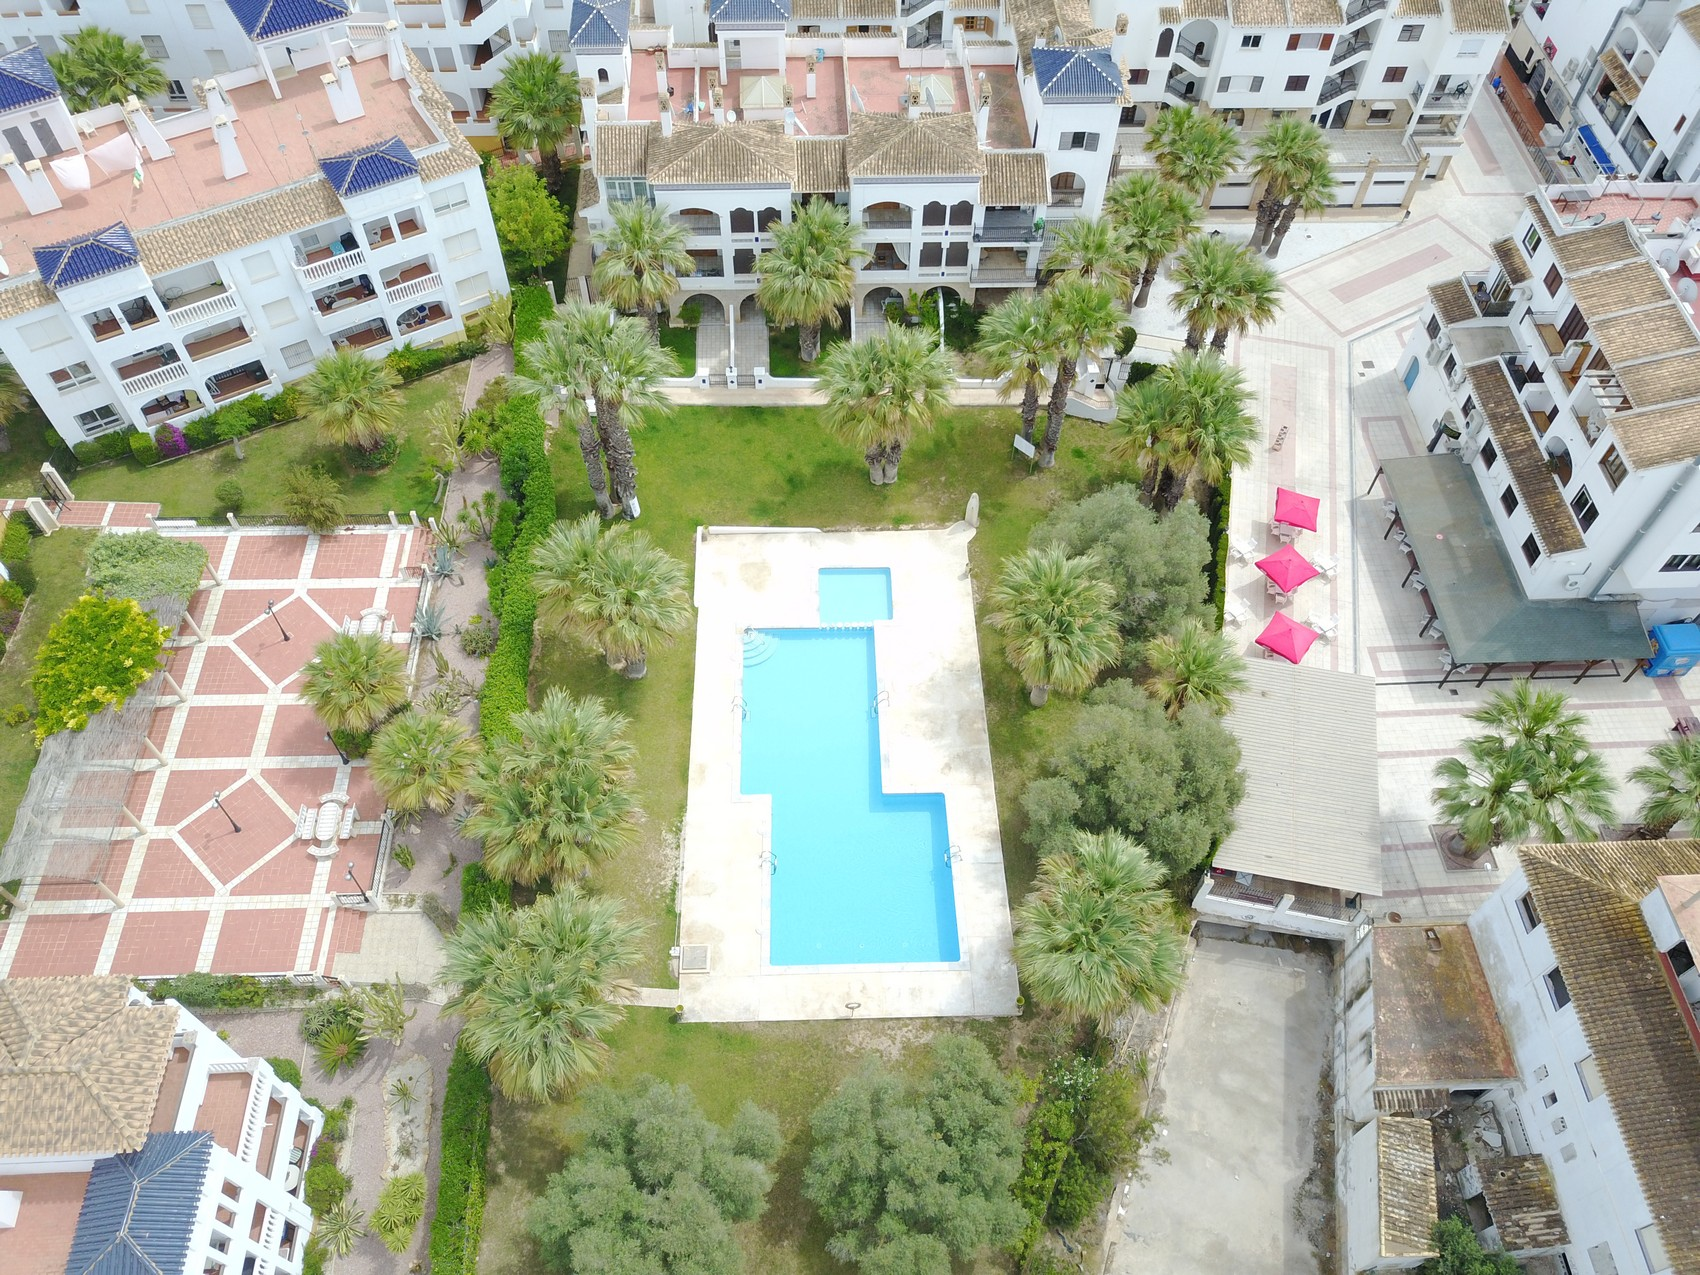 ITSH Property communal pool by Drone 3